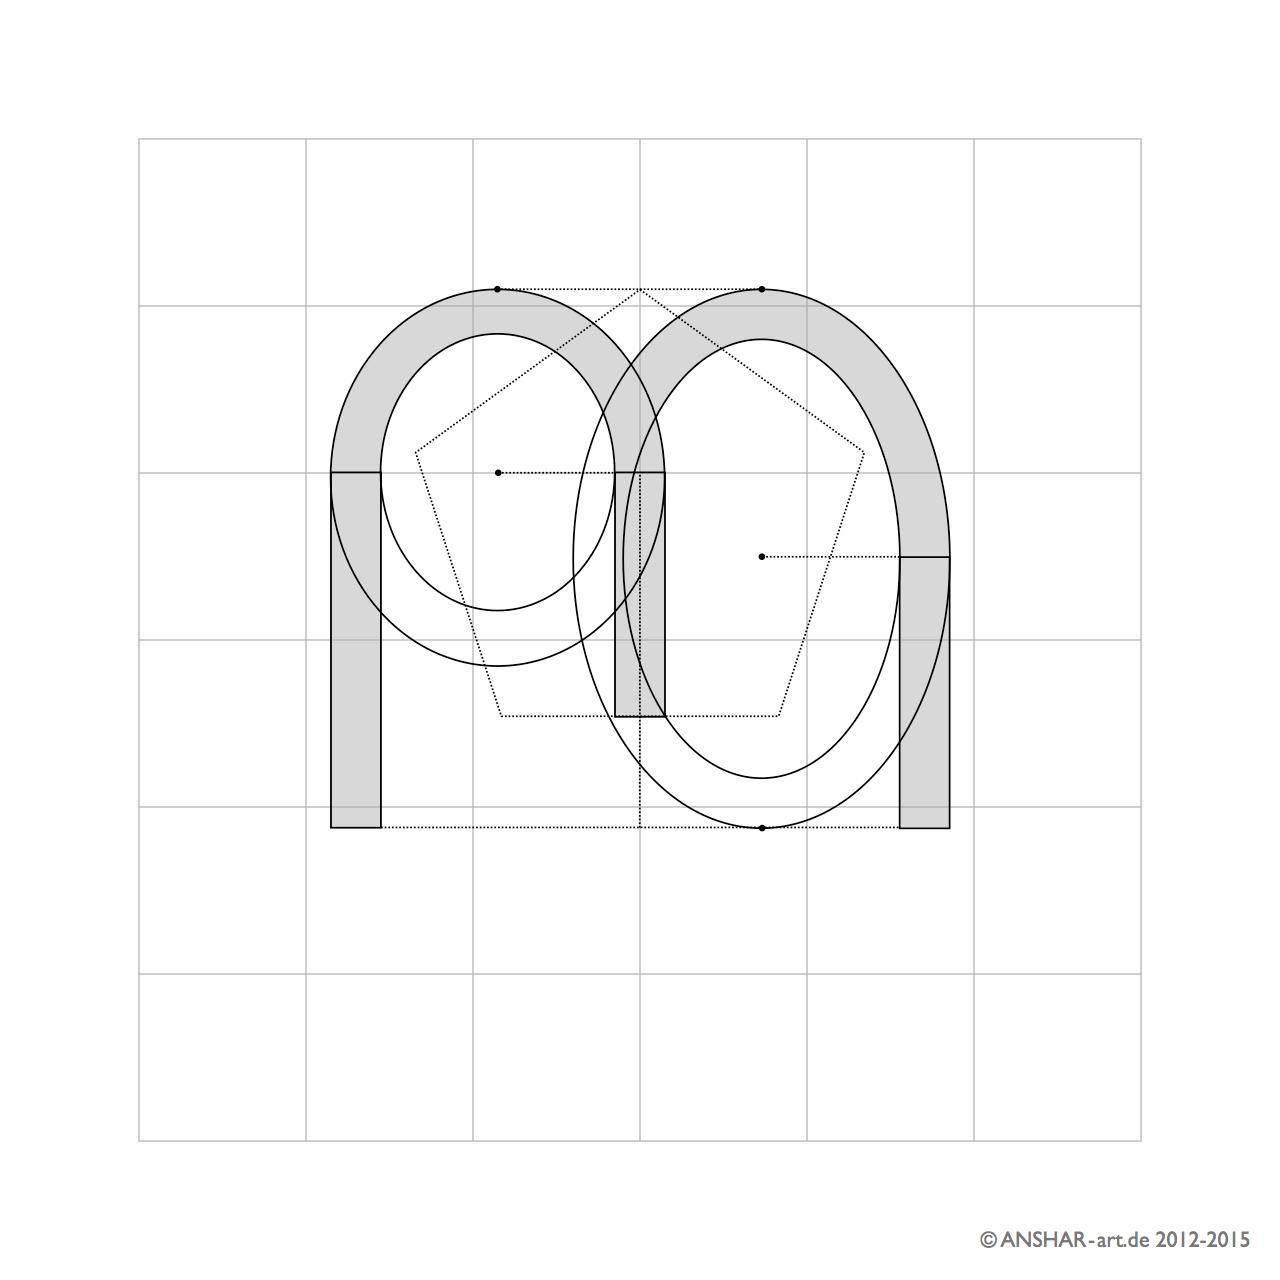 M = 9